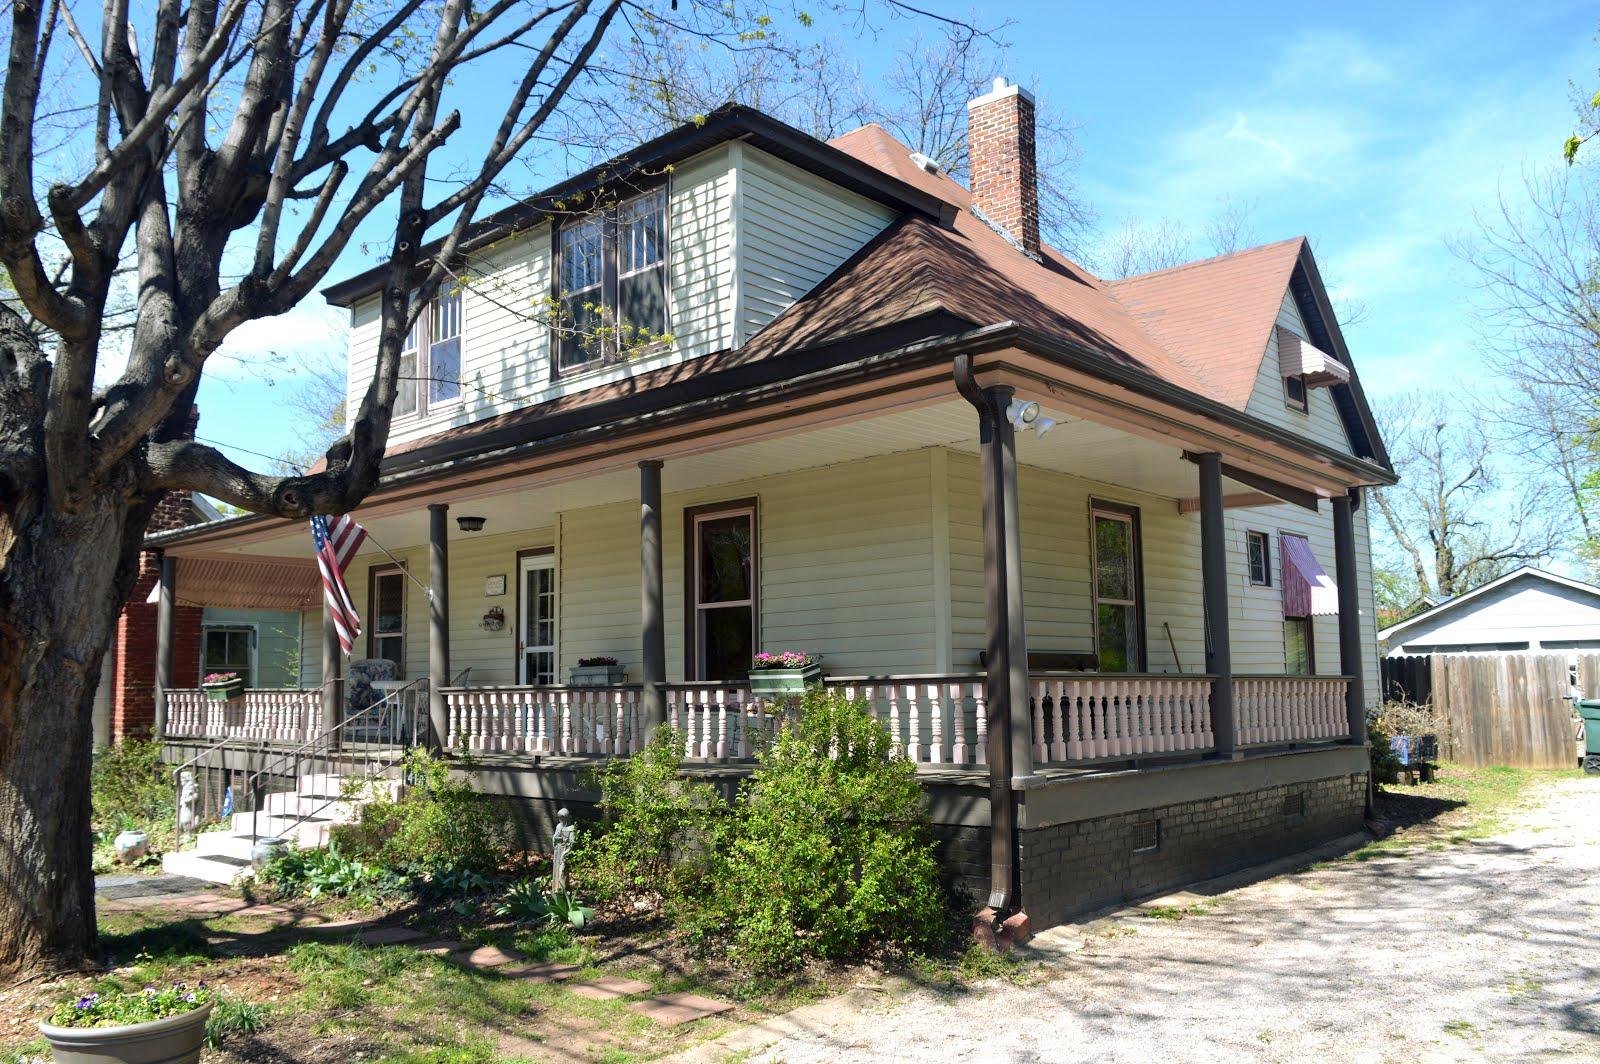 418 E. Fisher Street, Salisbury NC 28144 ~ circa 1875 ~ $139,900